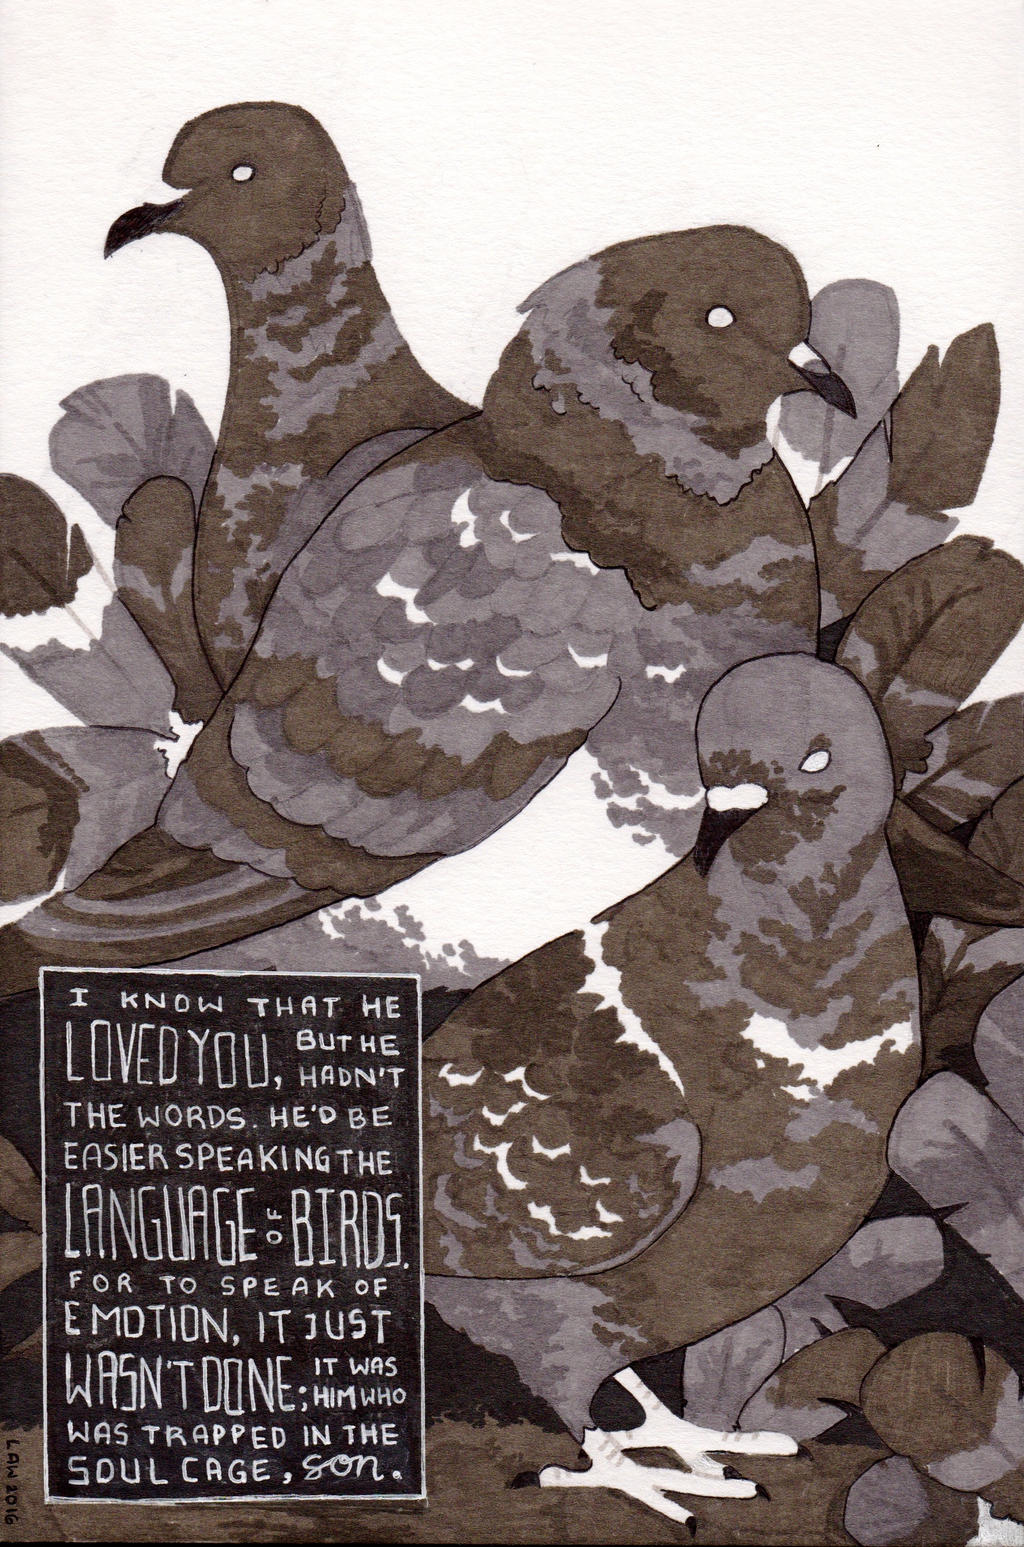 The Language of Birds.